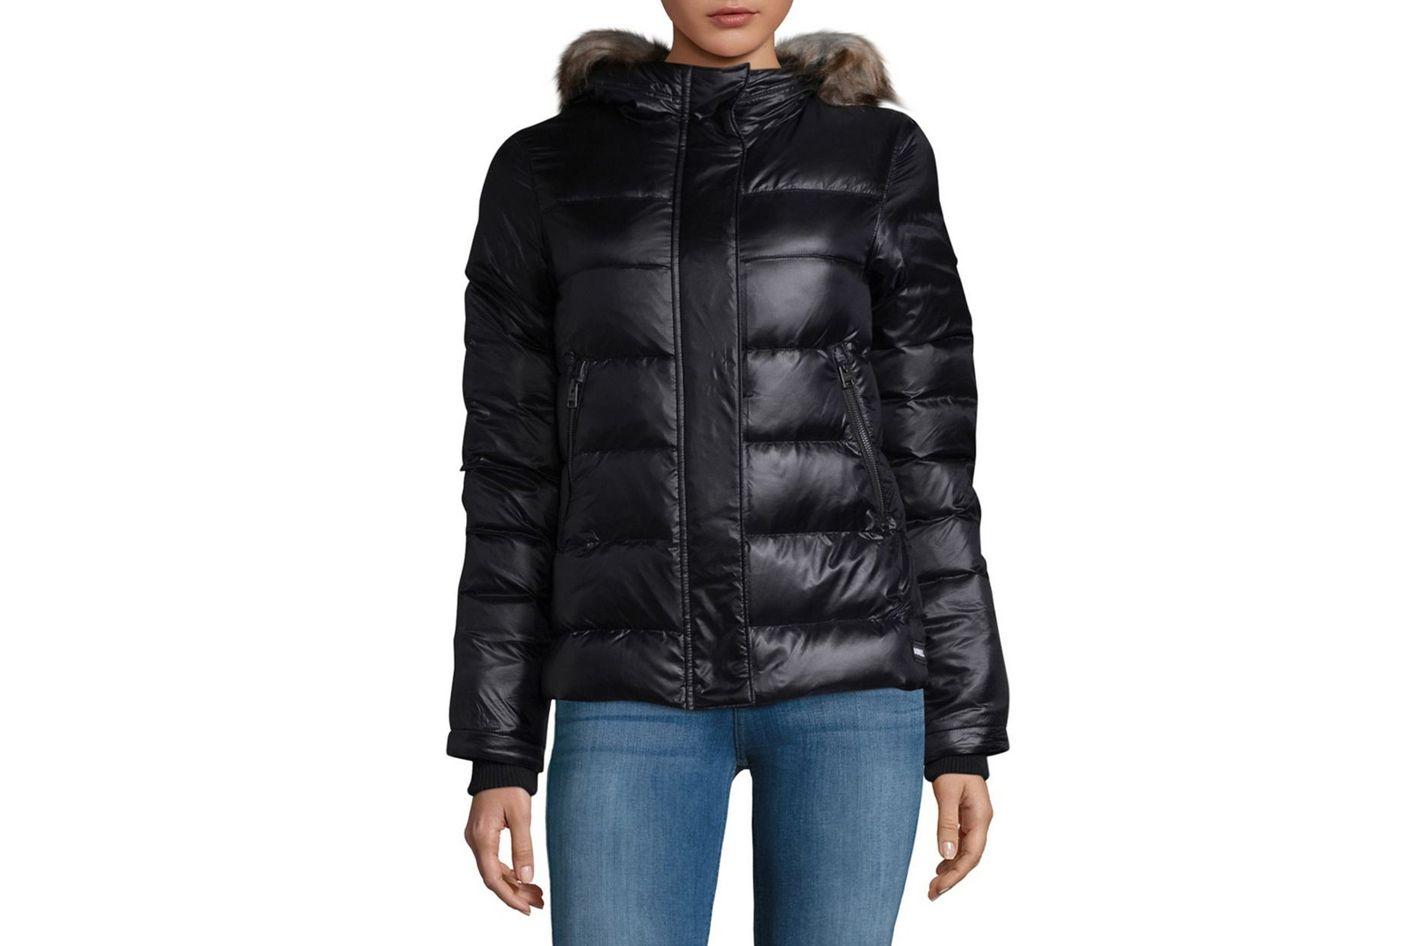 Sorel Faux Fur-Trimmed Down Puffer Jacket